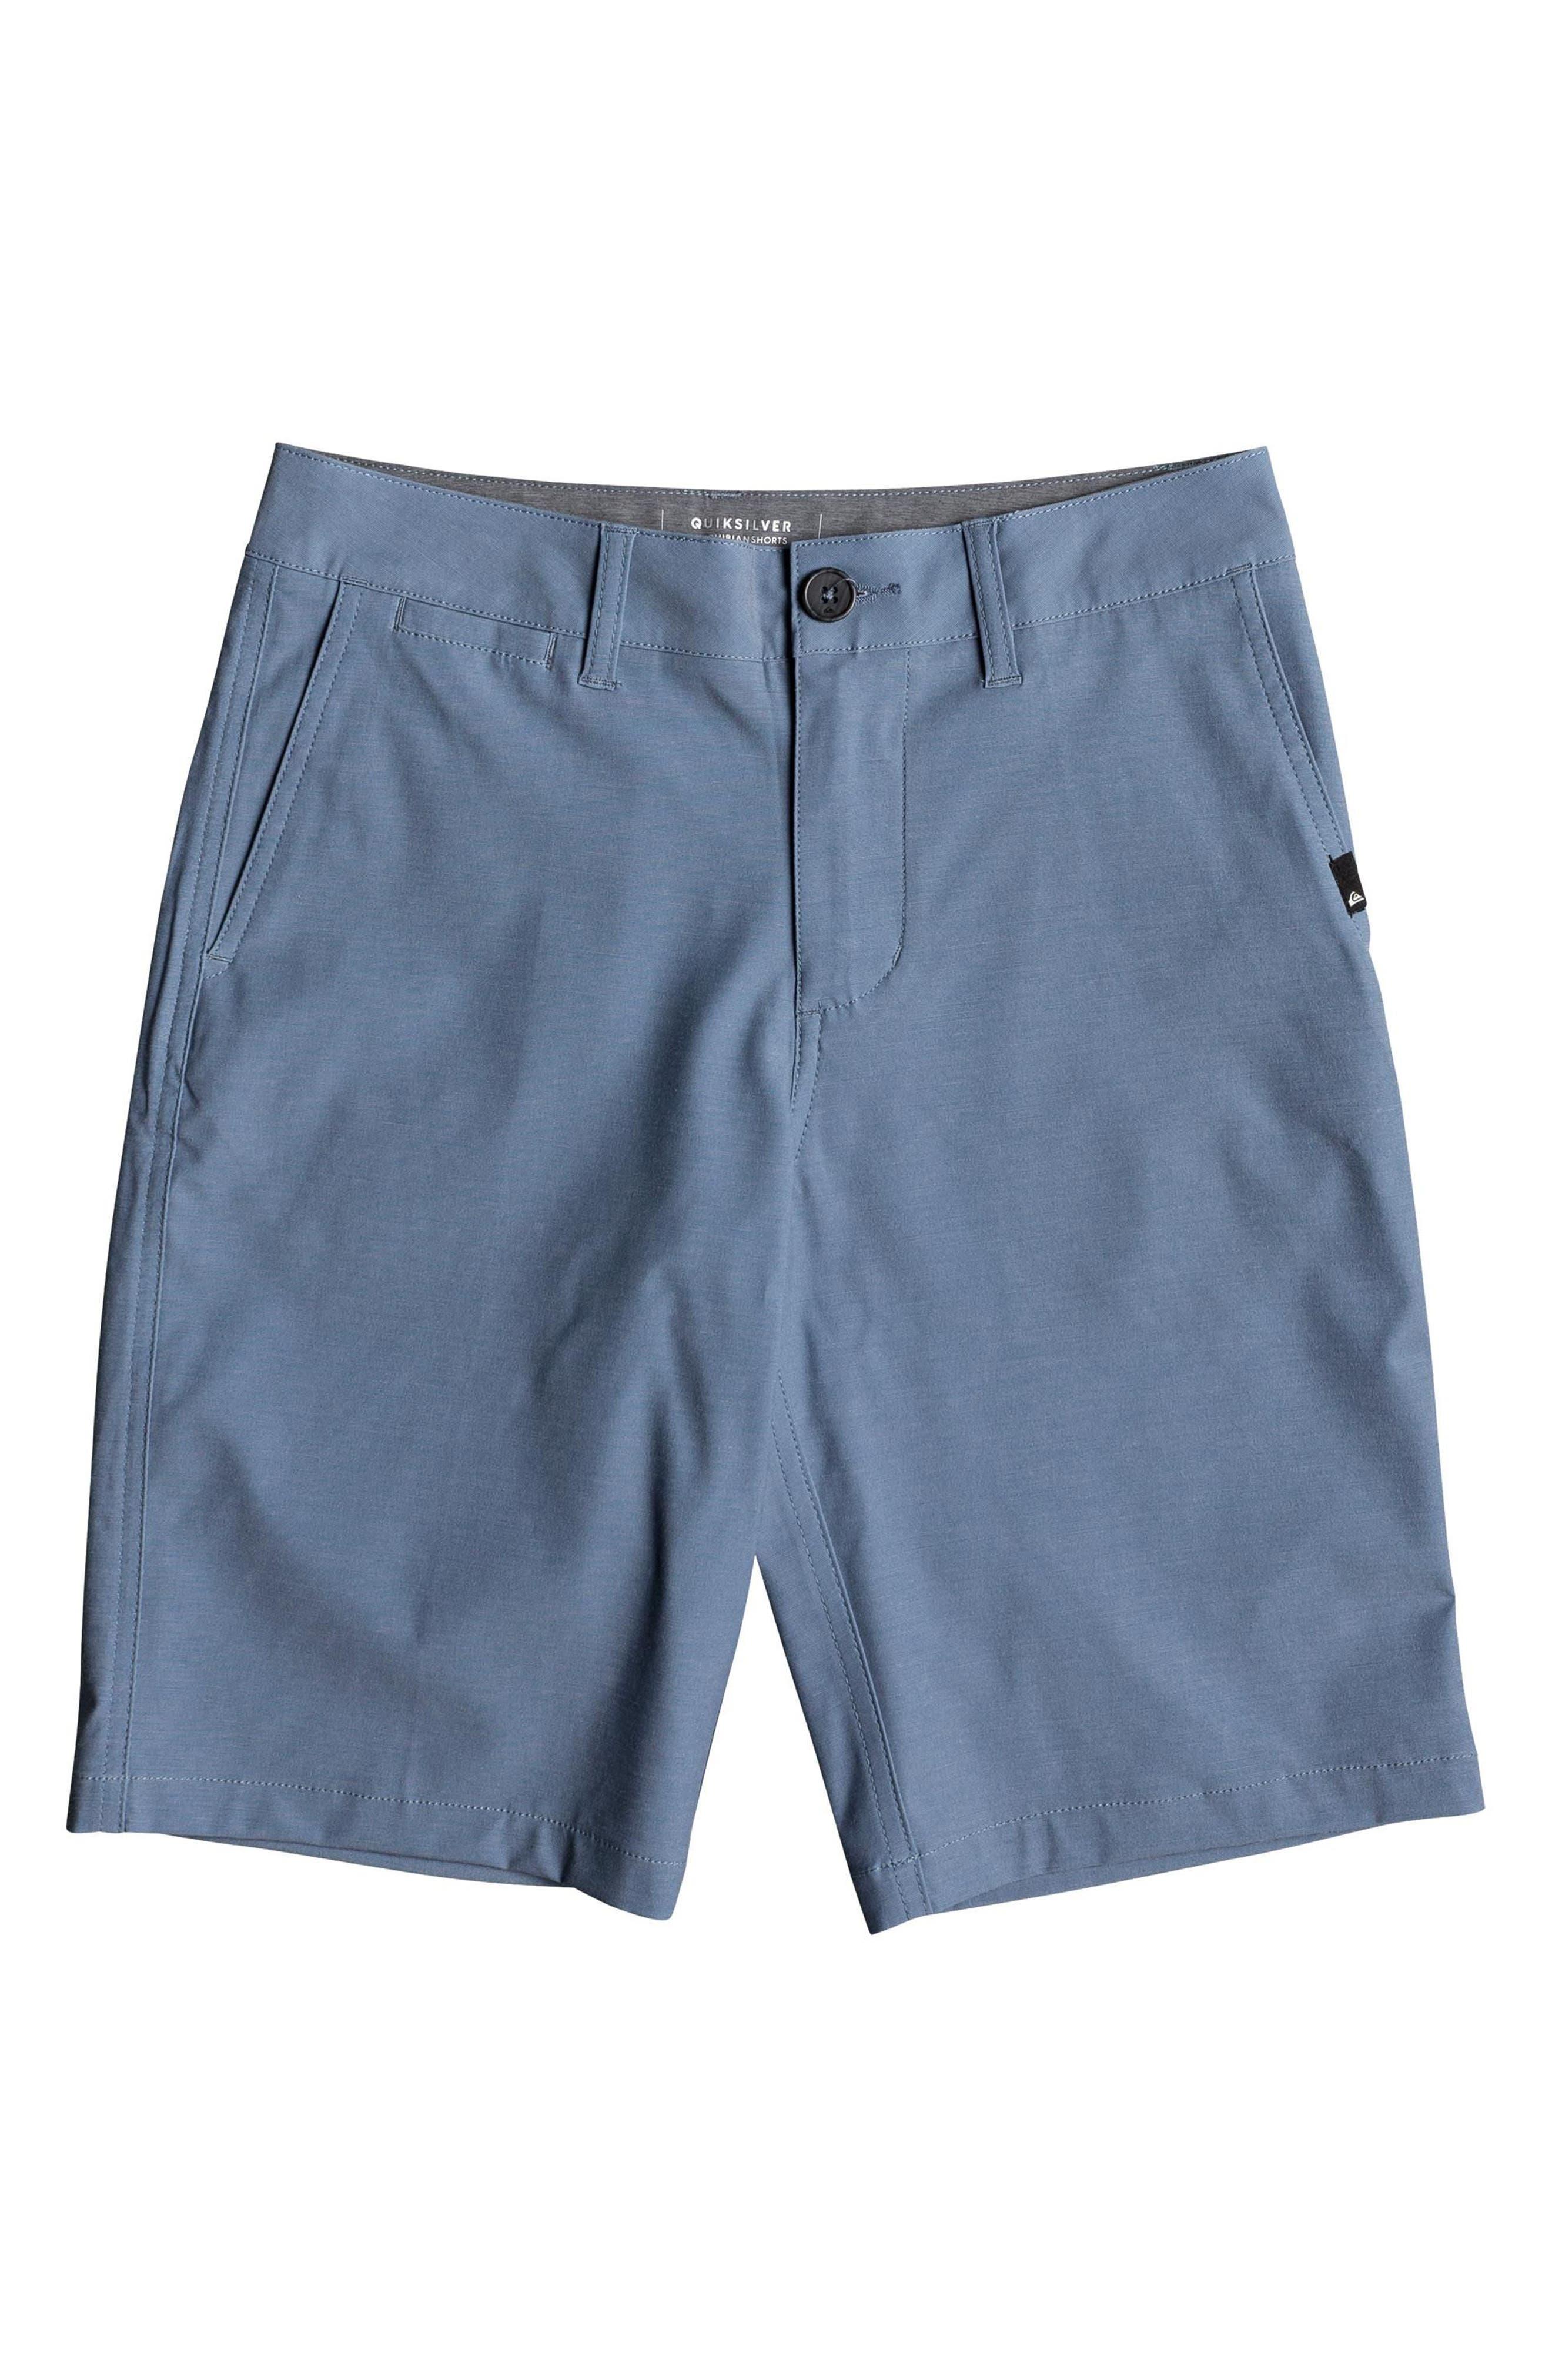 Quiksilver Union Heather Amphibian Hybrid Shorts (Big Boys)